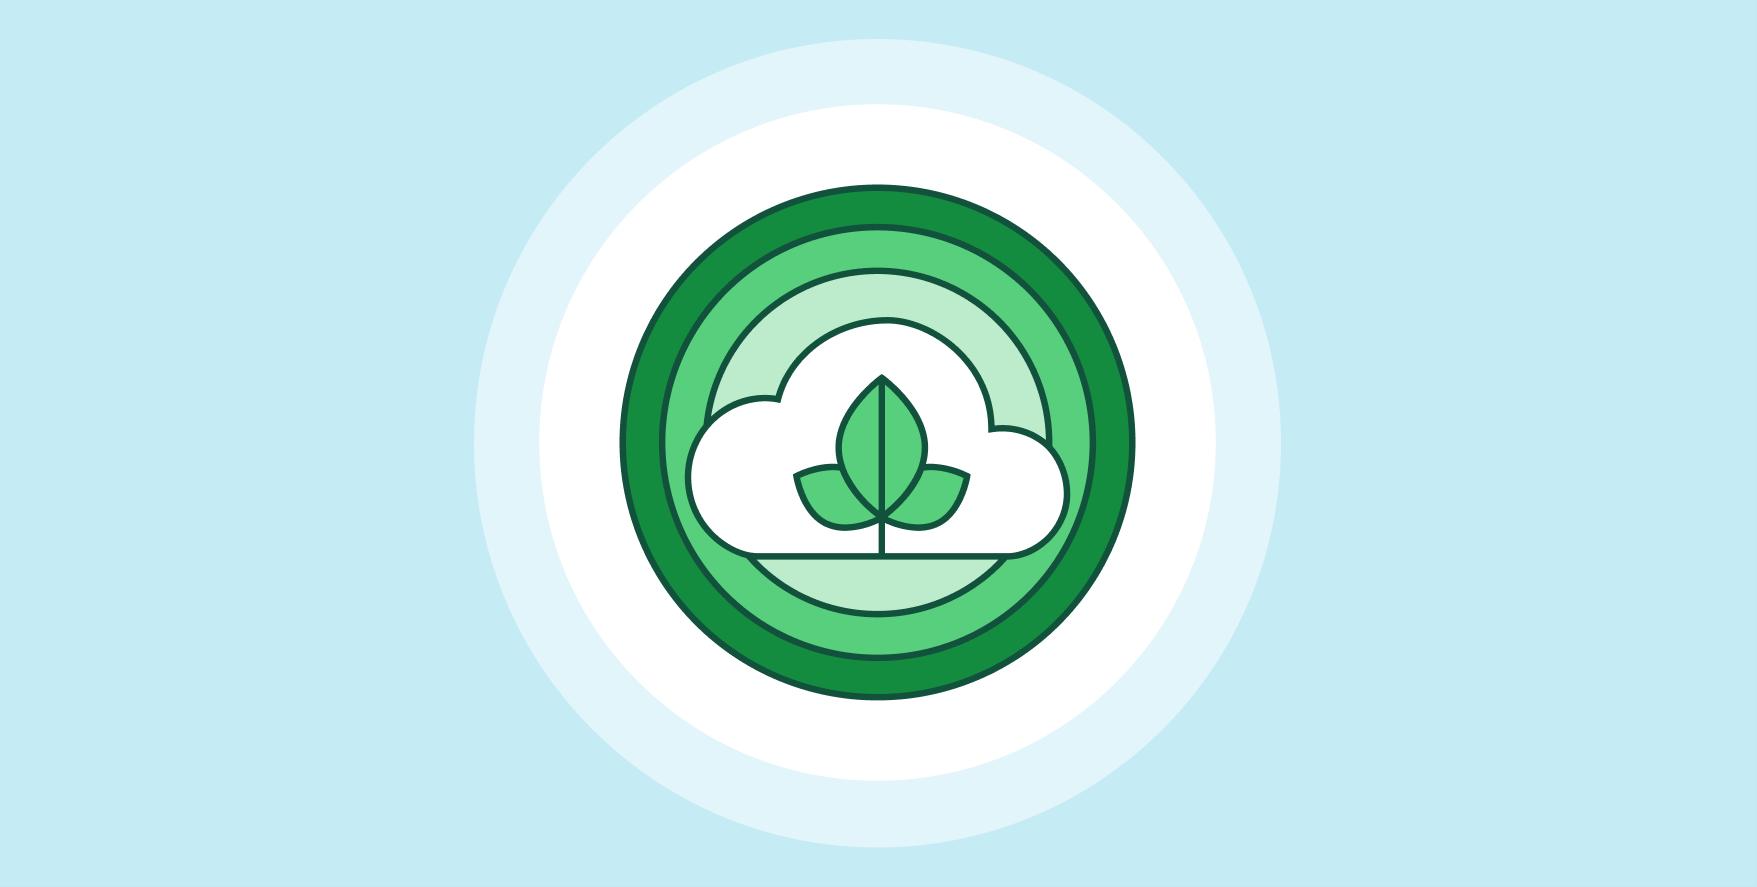 Introducing Greencloud